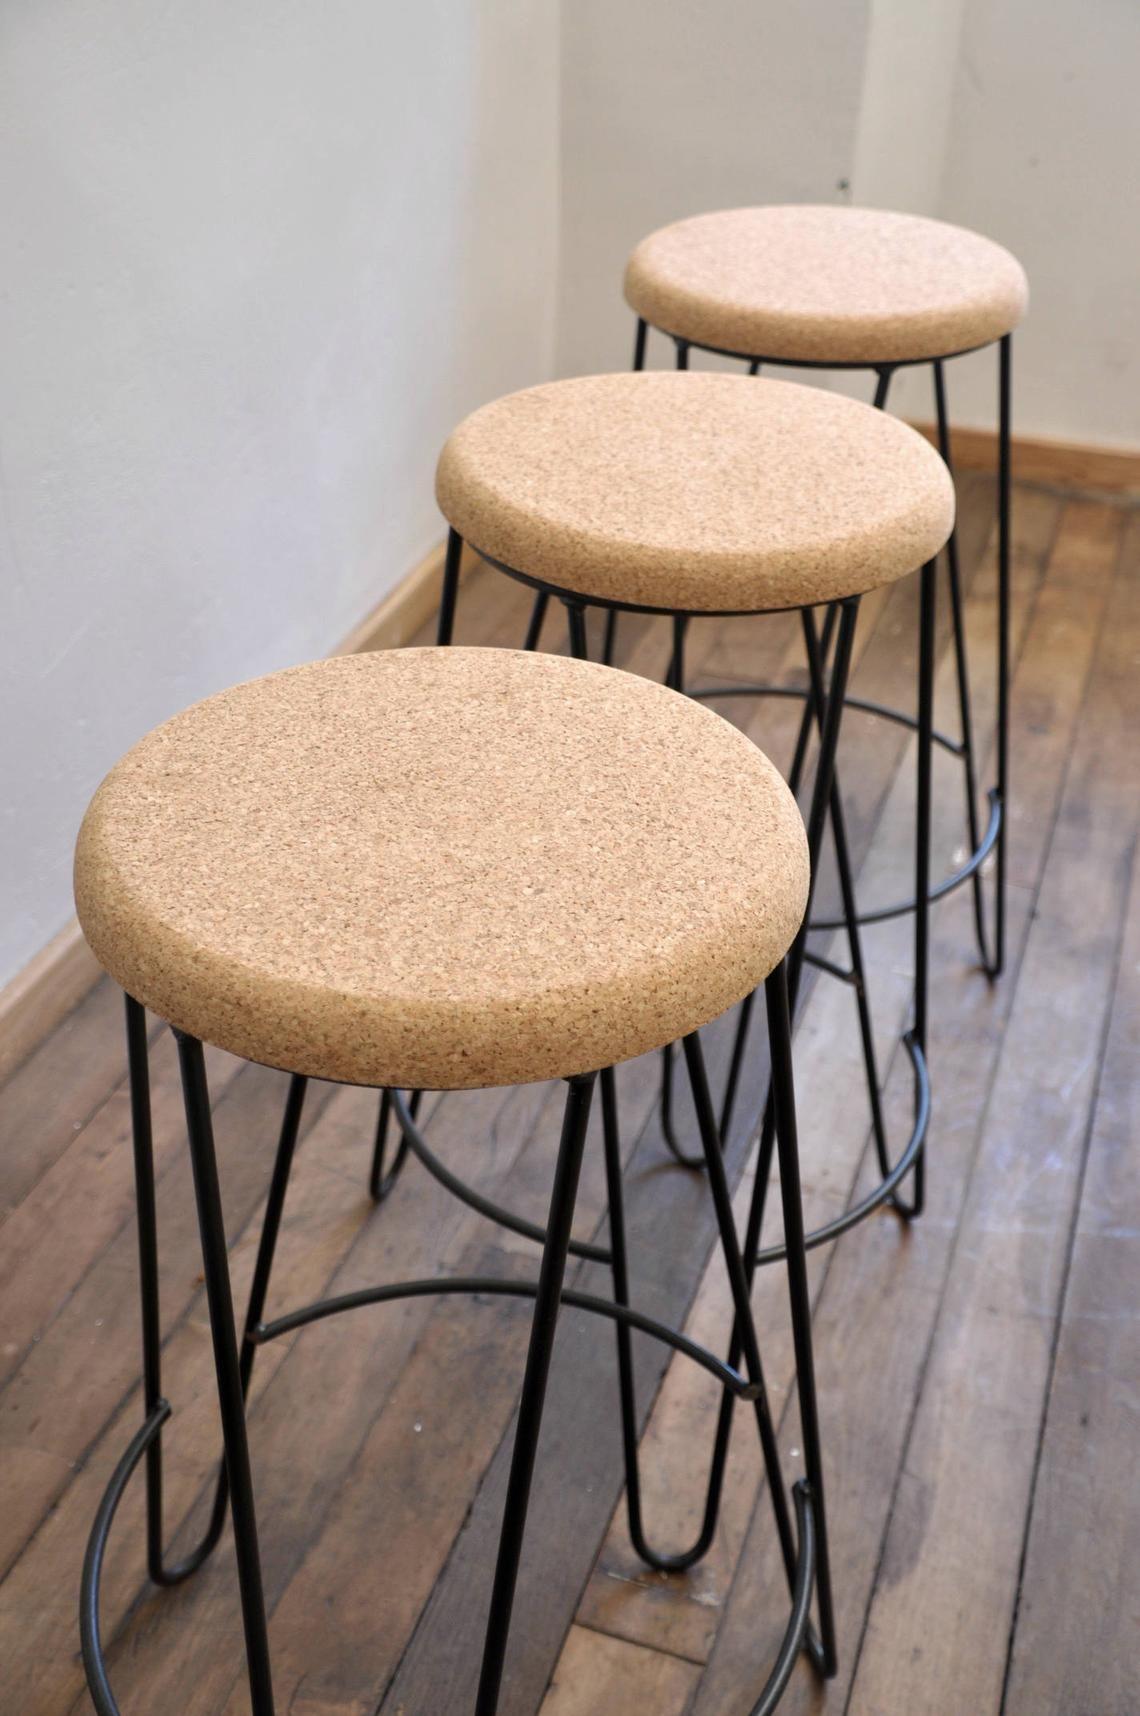 Industrial Bar Stool With Cork Seat Handmade Etsy Industrial Bar Stools Bar Stools Stool